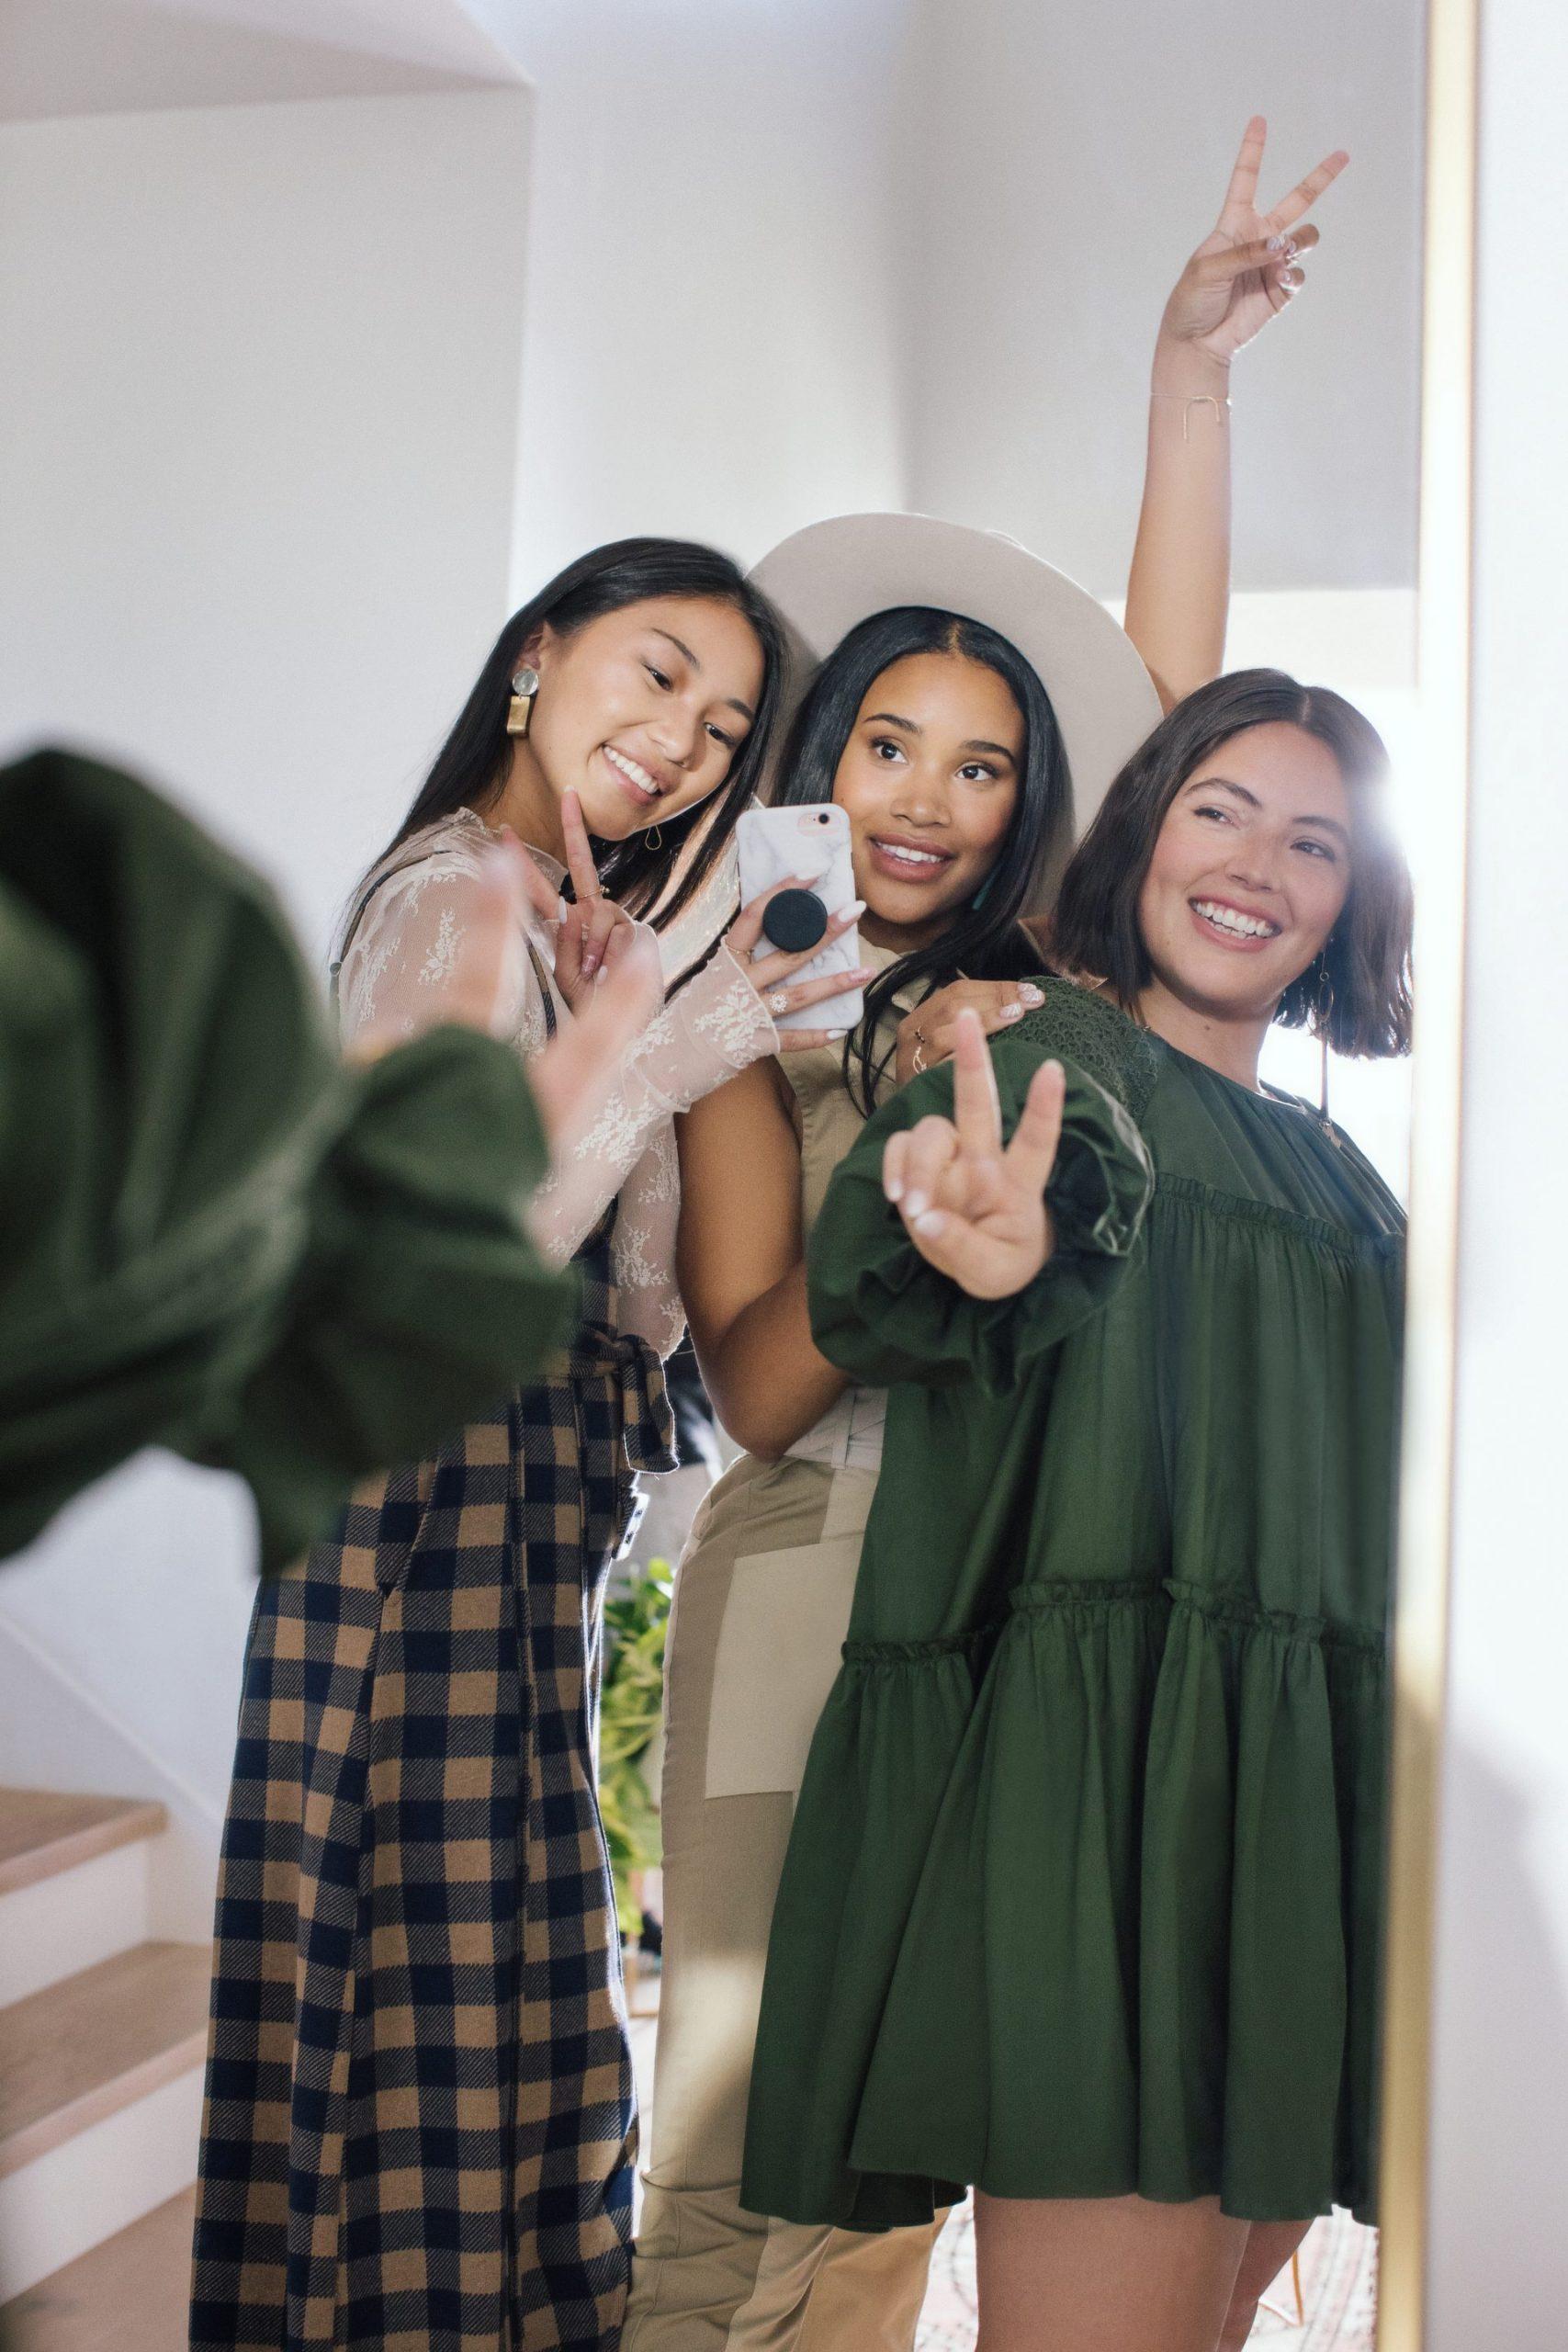 Three friends taking a selfie